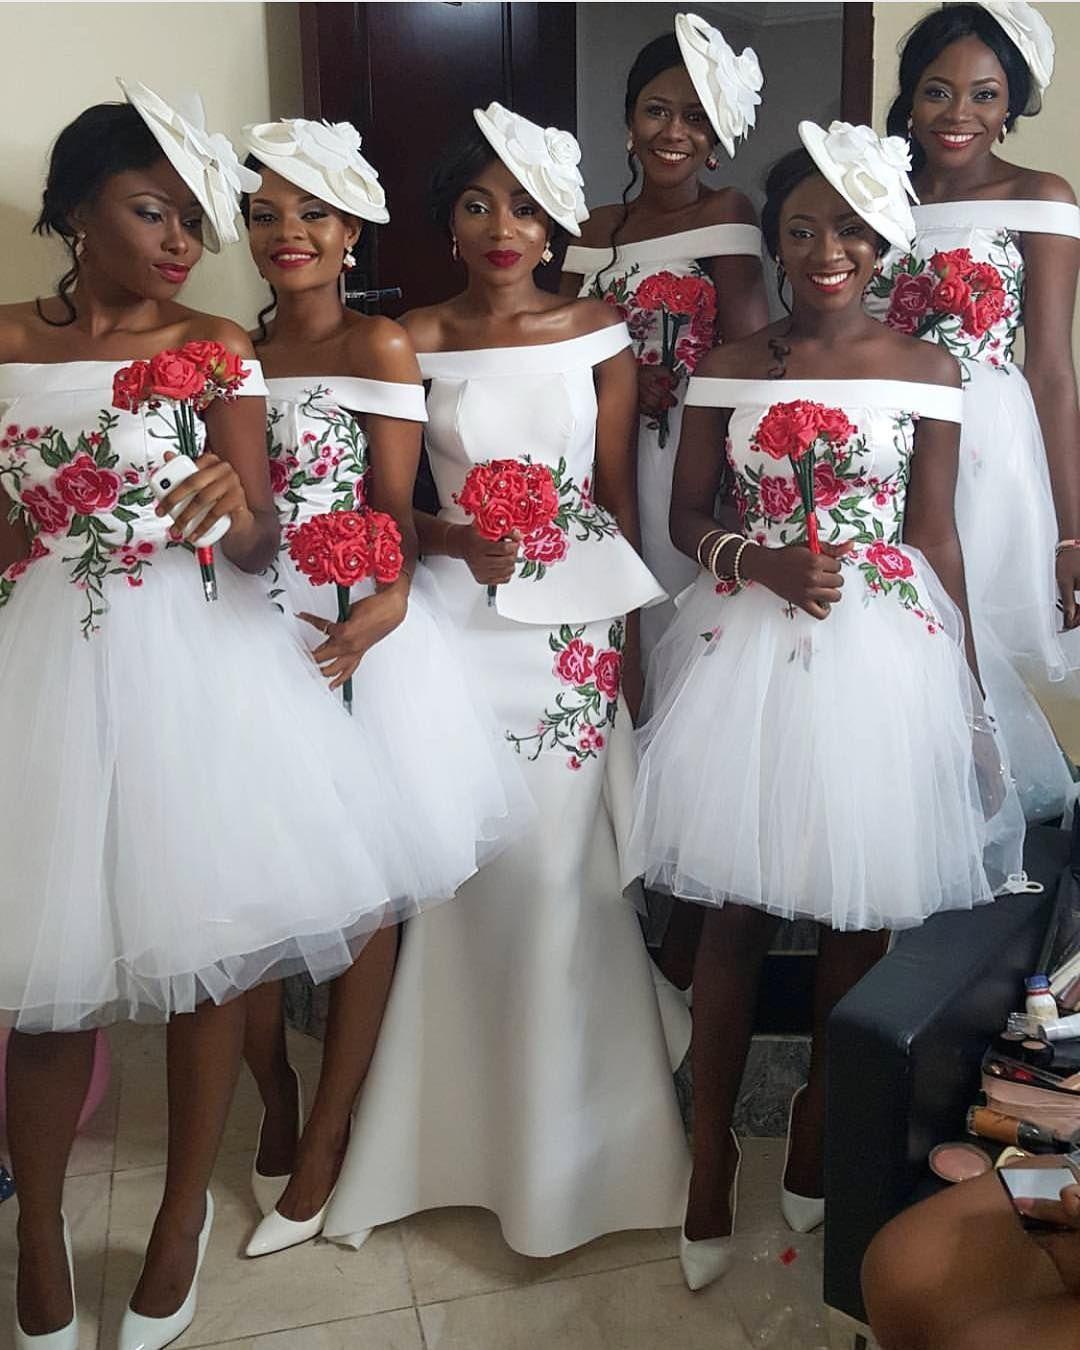 802 Likes 9 Comments No 1 Nigerian Wedding Blog Nigerianwedding On Instagram African Bridesmaid Dresses African Fashion Dresses Short Bridesmaid Dresses